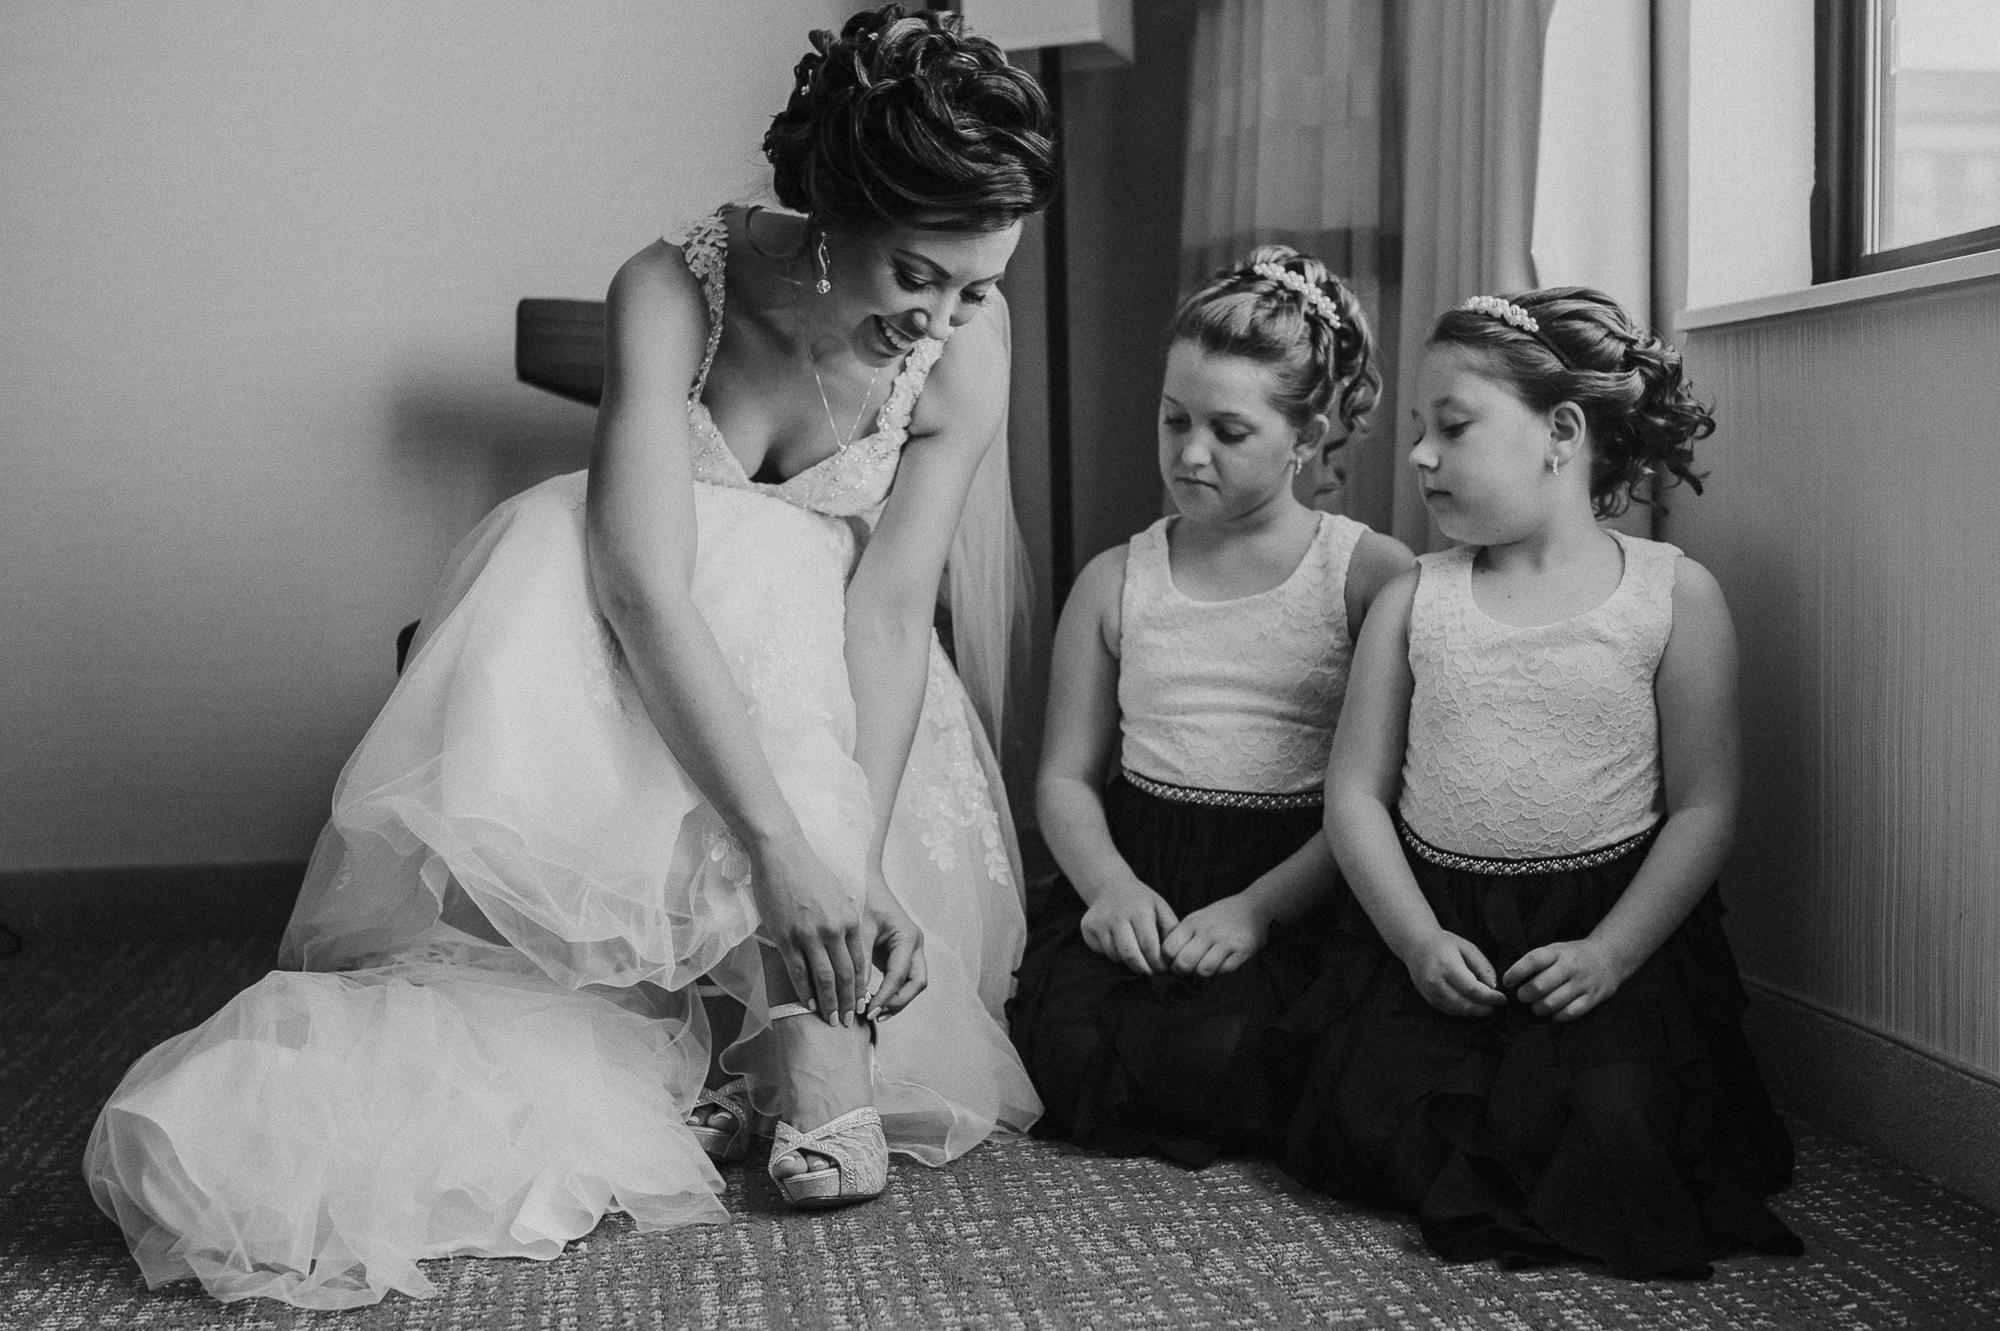 Christina-and-Gene-Wedding-Marla-Rain-Photography-97.jpg